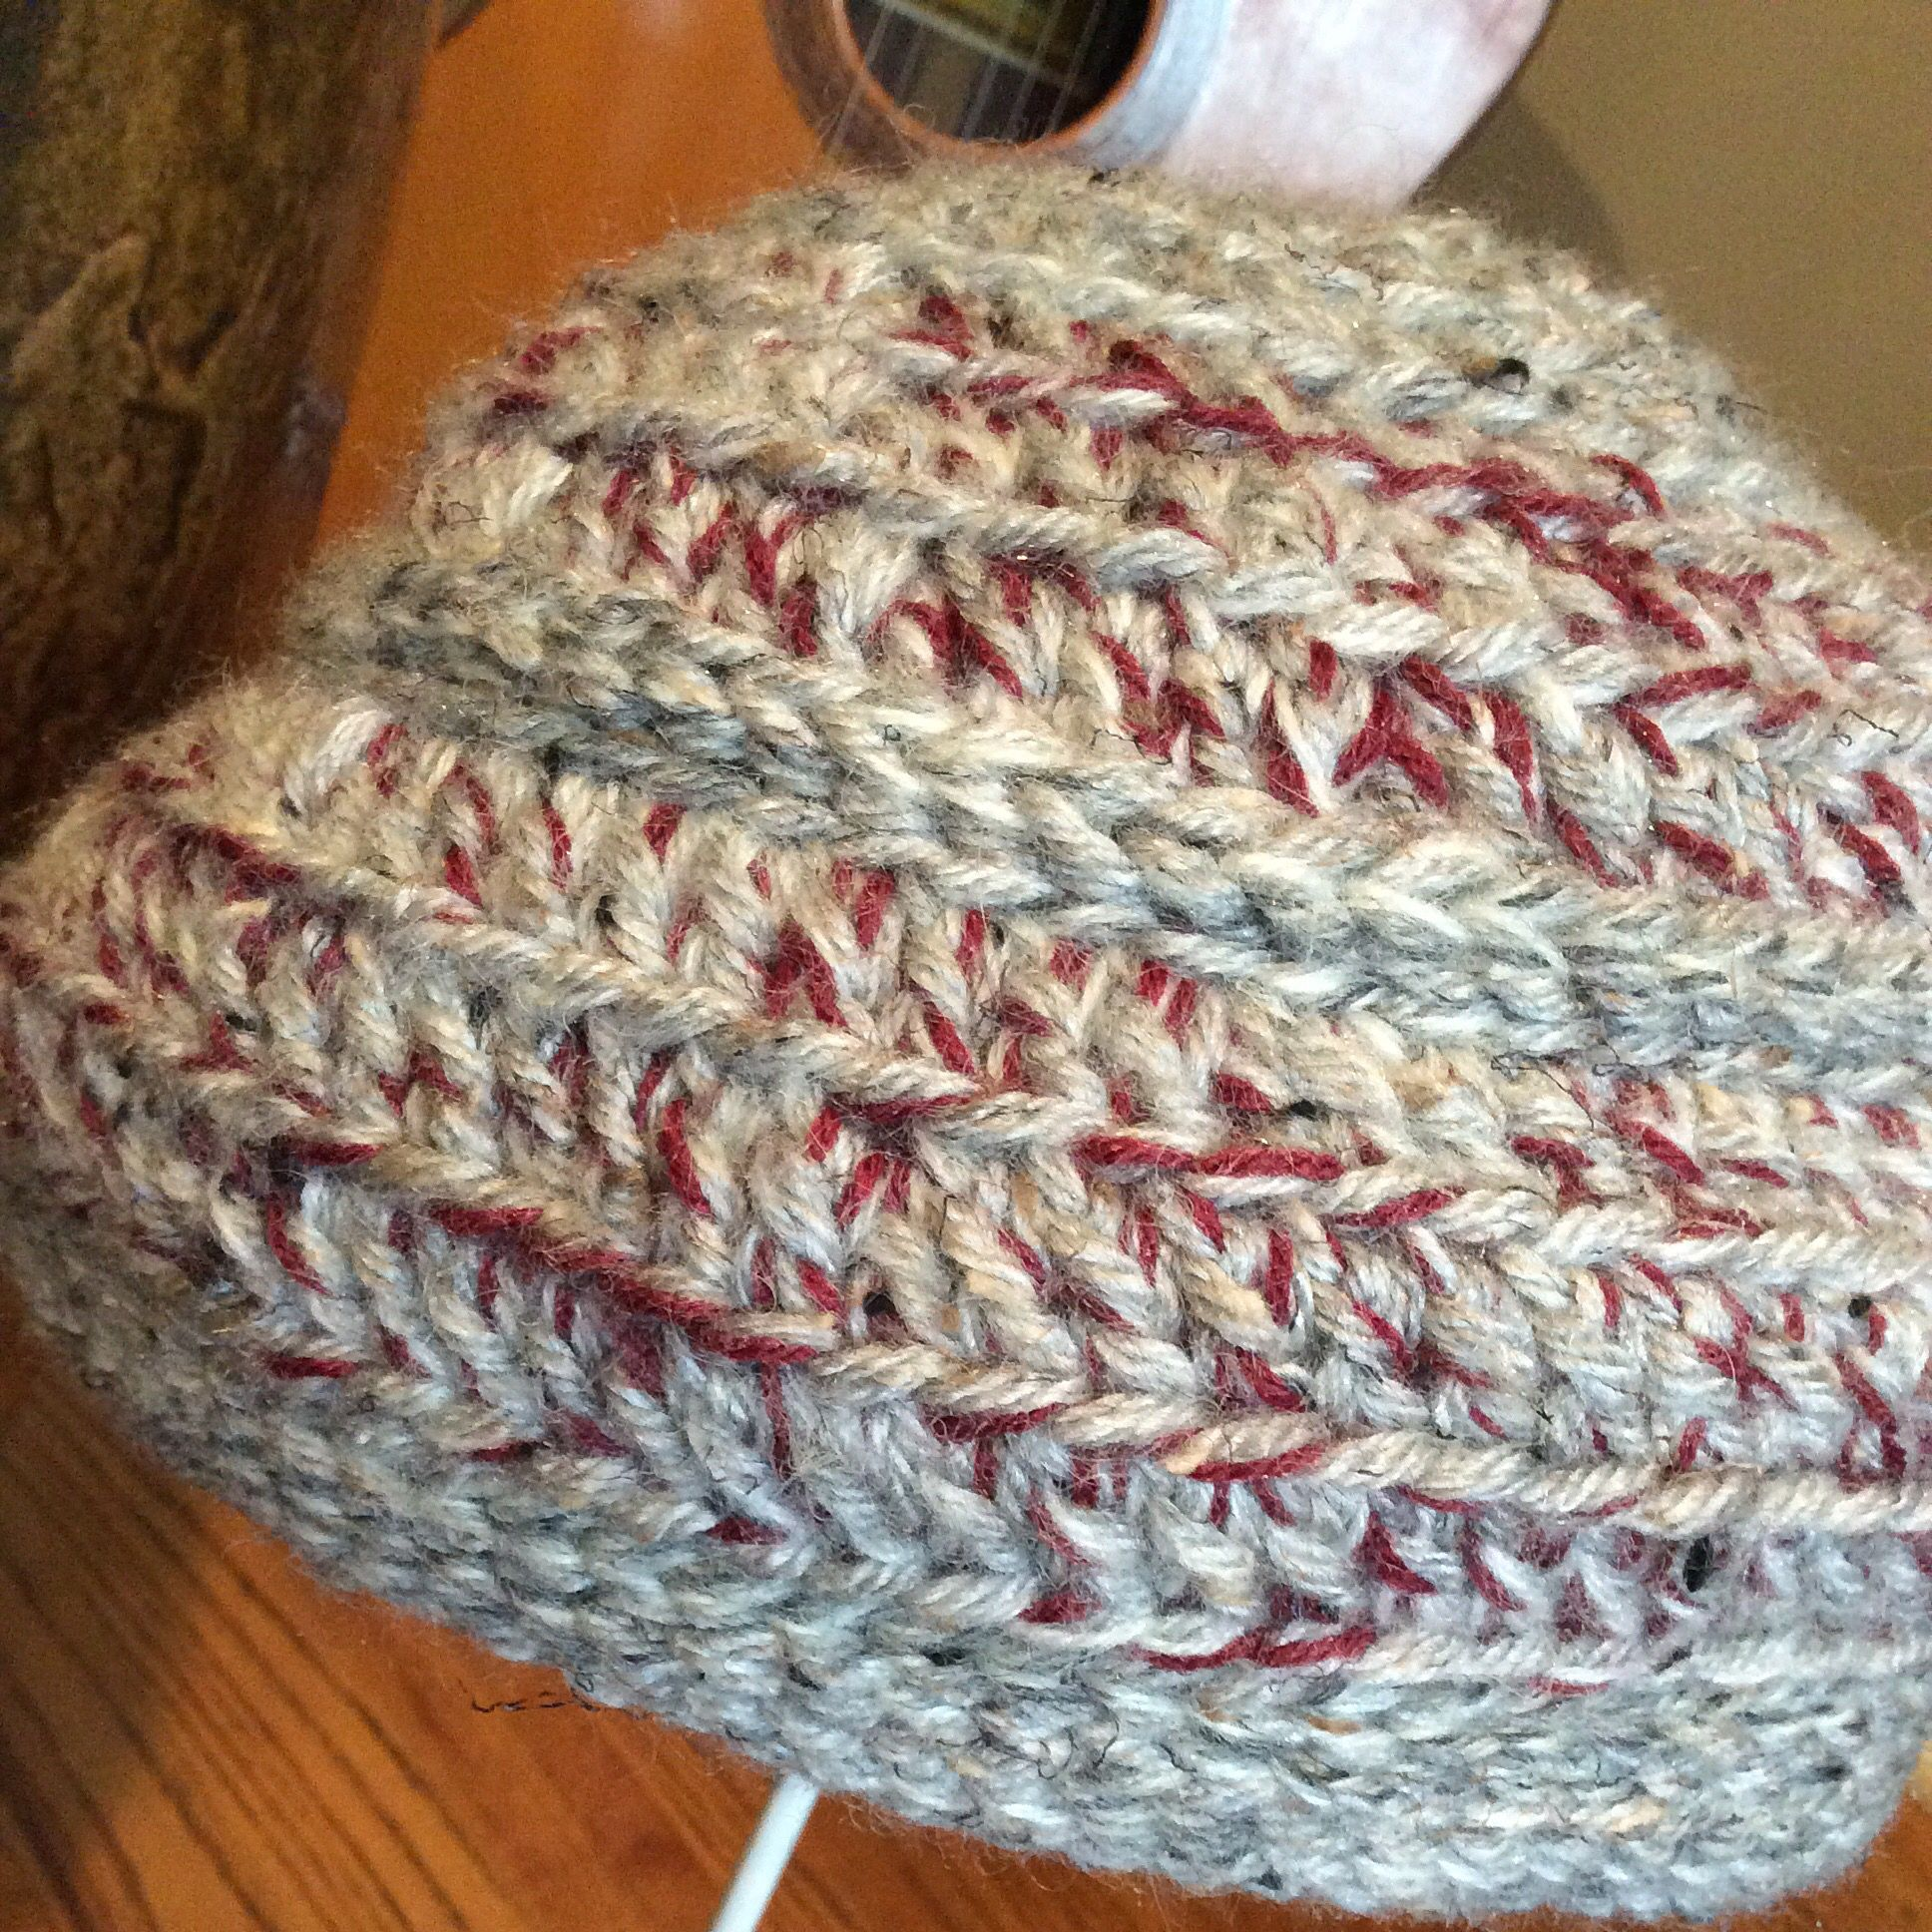 Hats By Sunnylookbysunnylook.etsy.com #hats #womenswear #ladiesfashion #prettyhats